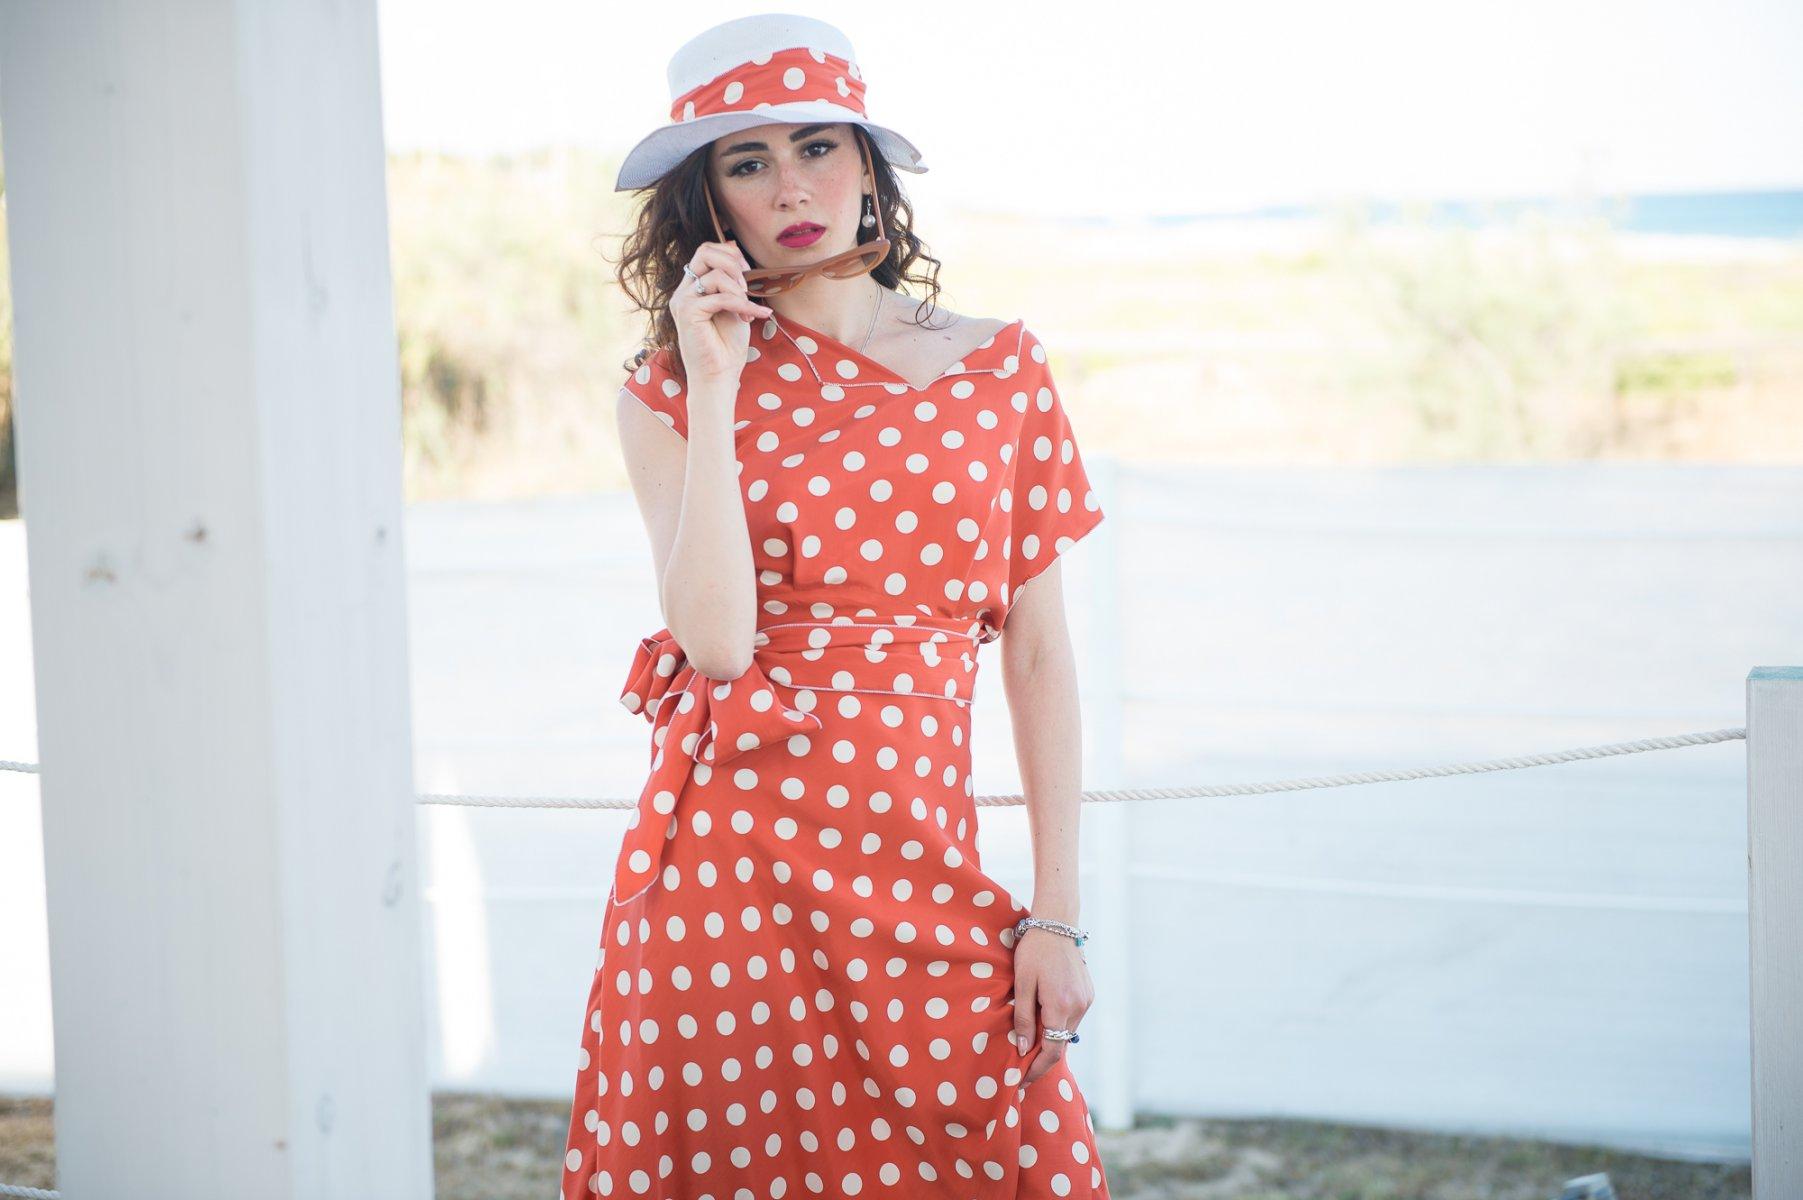 198-Pretty_Woman_MMD9524 Fashion/Adv